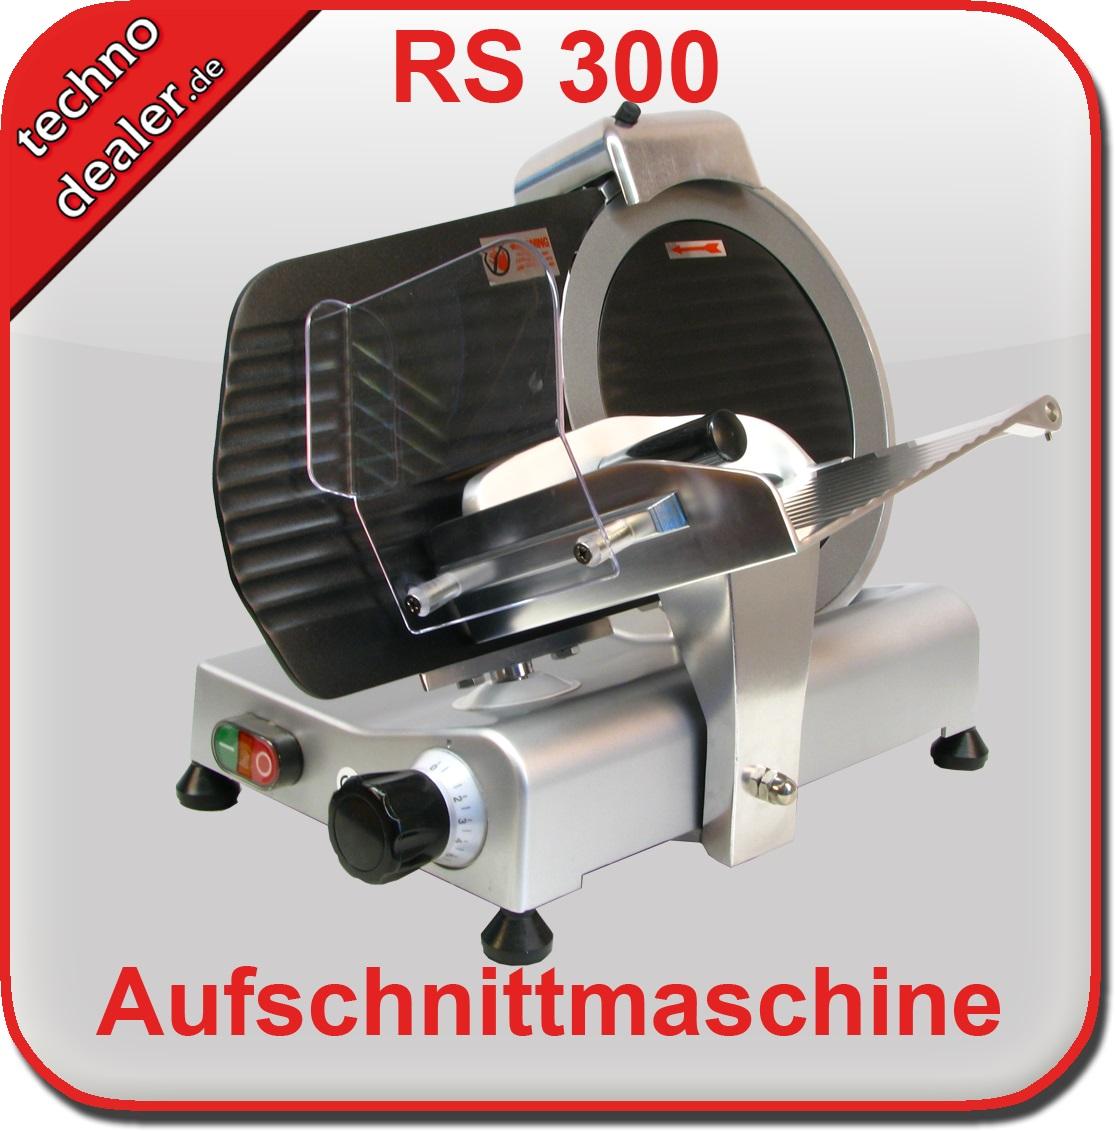 Aufschnittmaschine RS 300 teflon